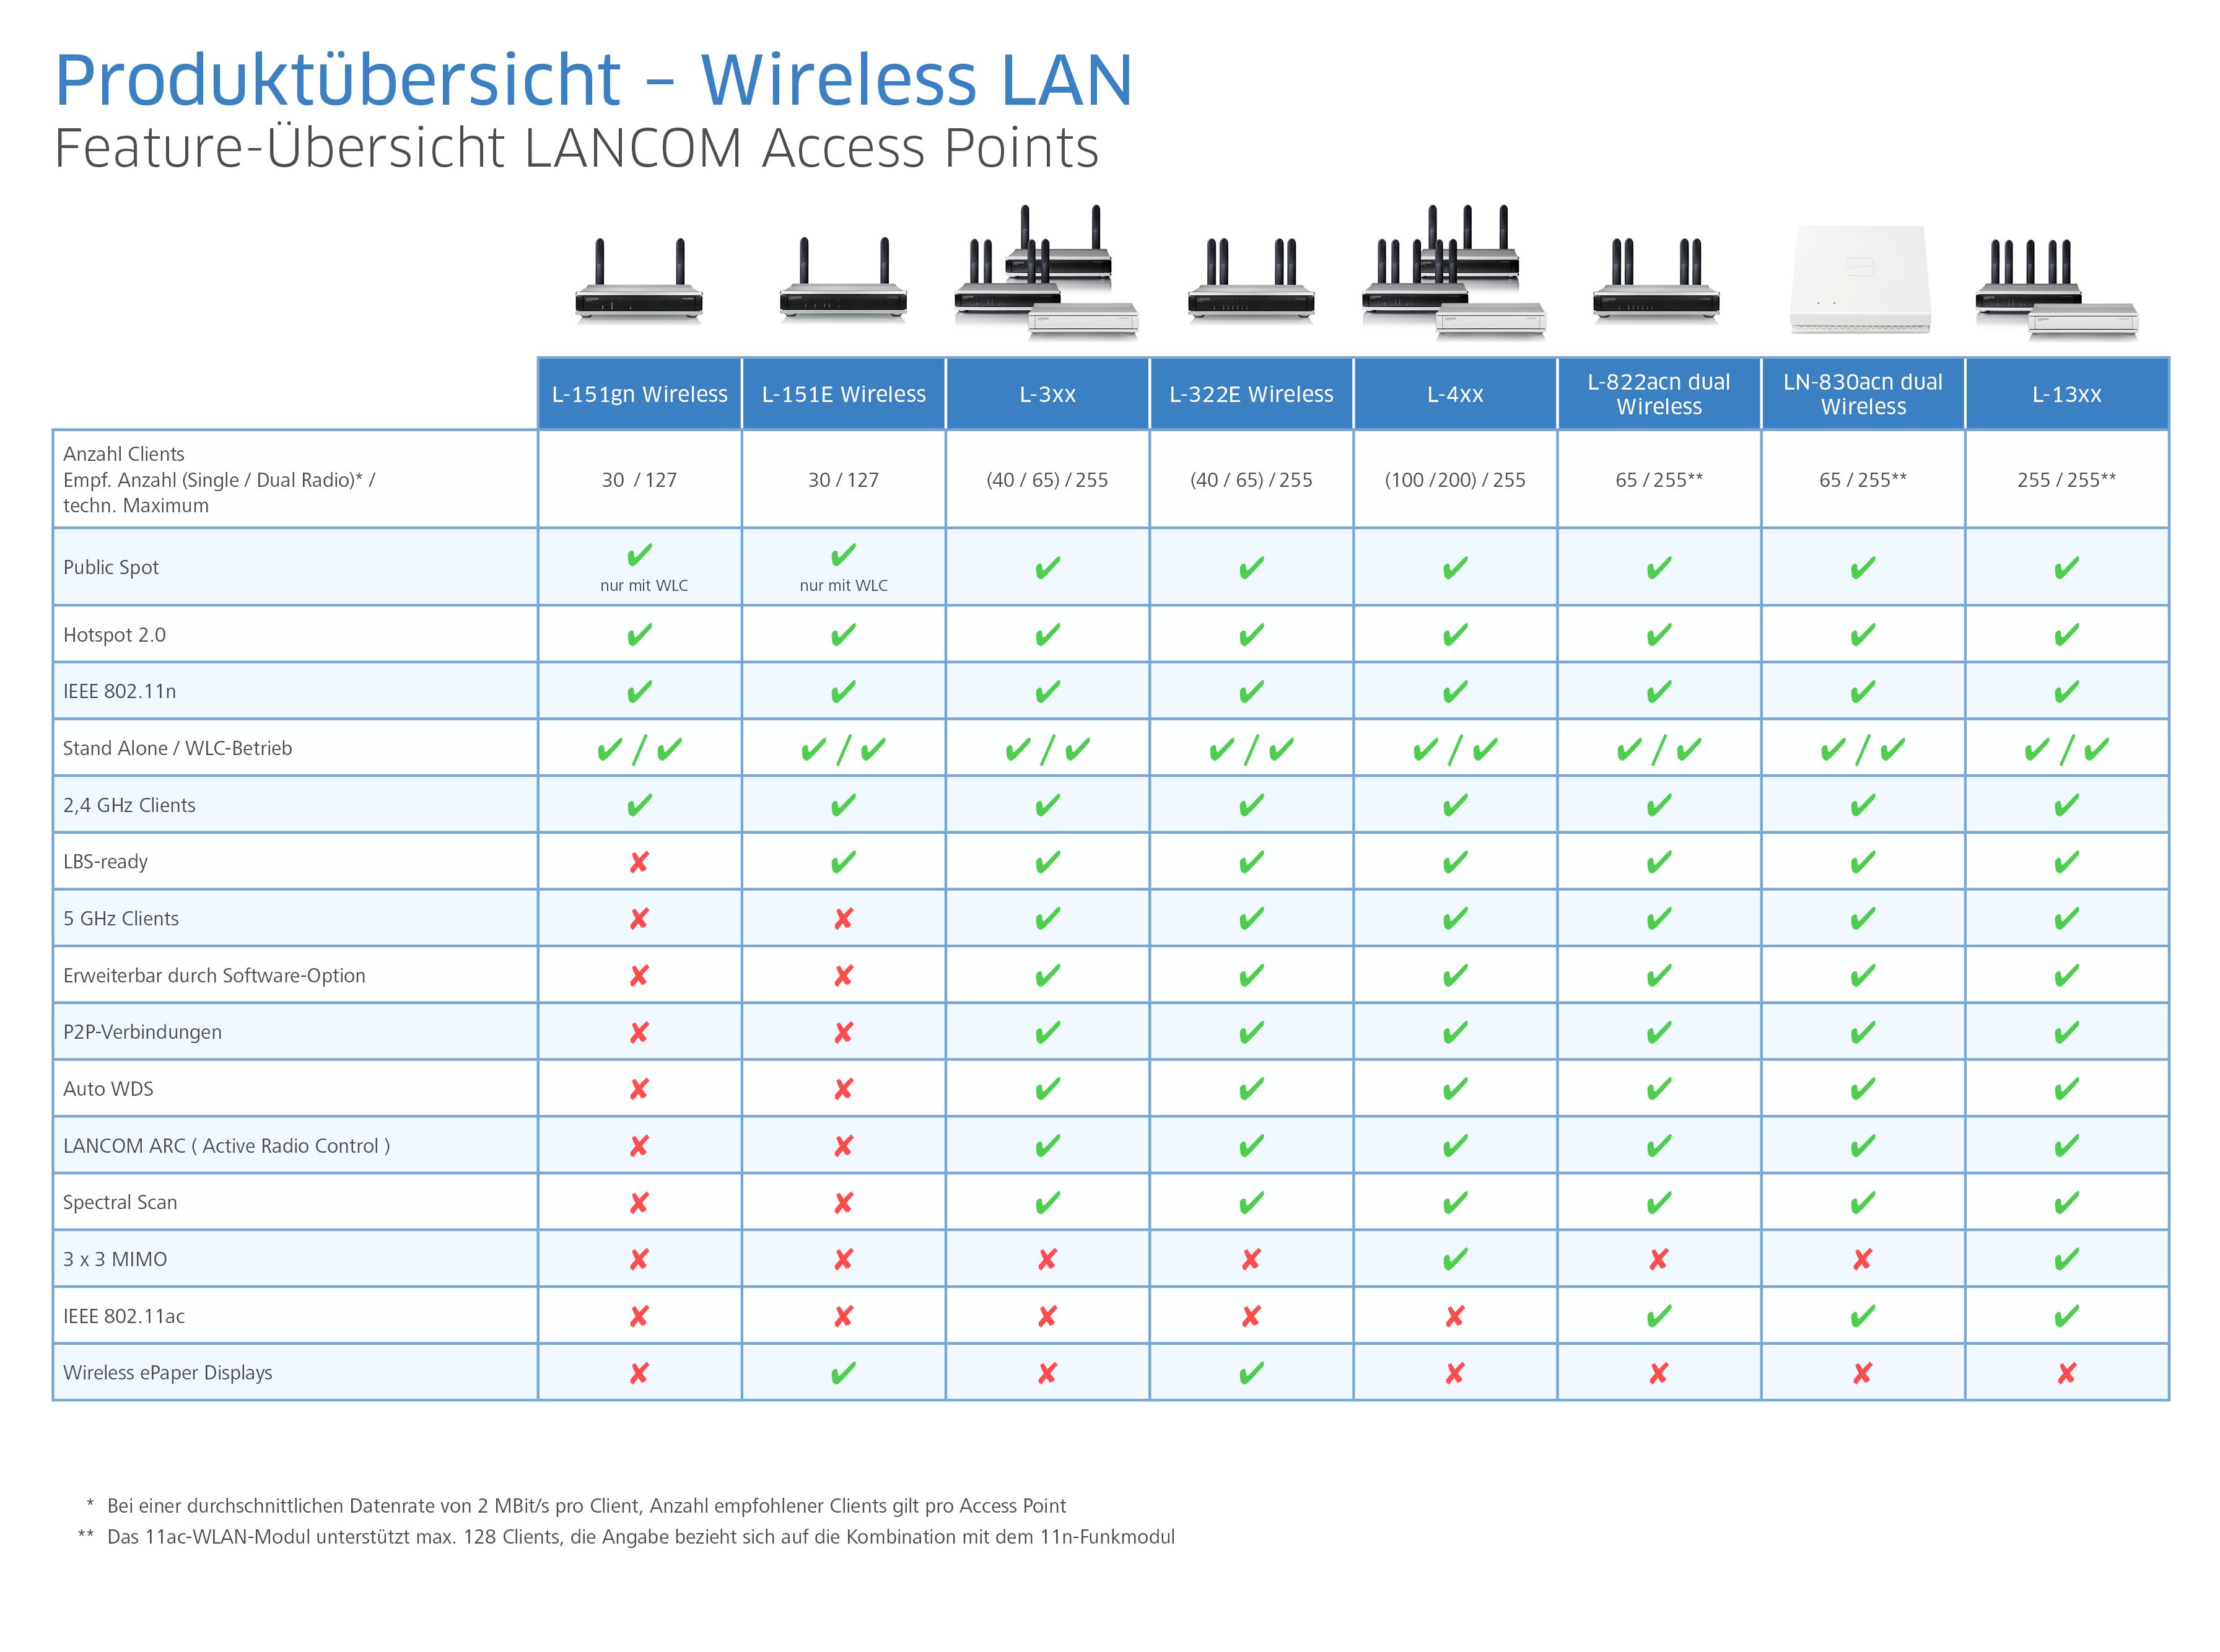 Feature-Übersicht LANCOM Access Points